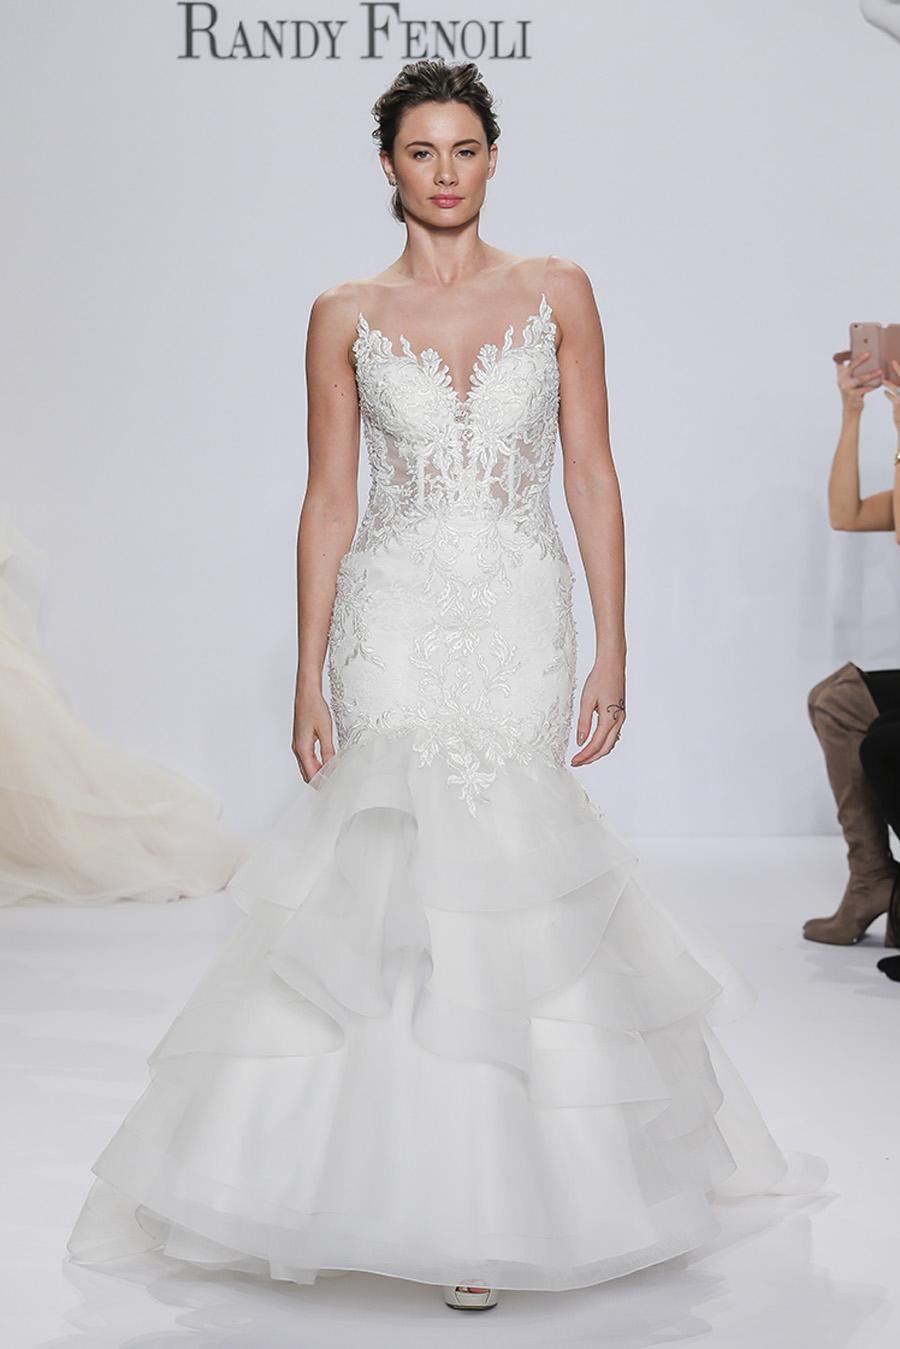 Randy Fenoli Bridal Collection gown 12